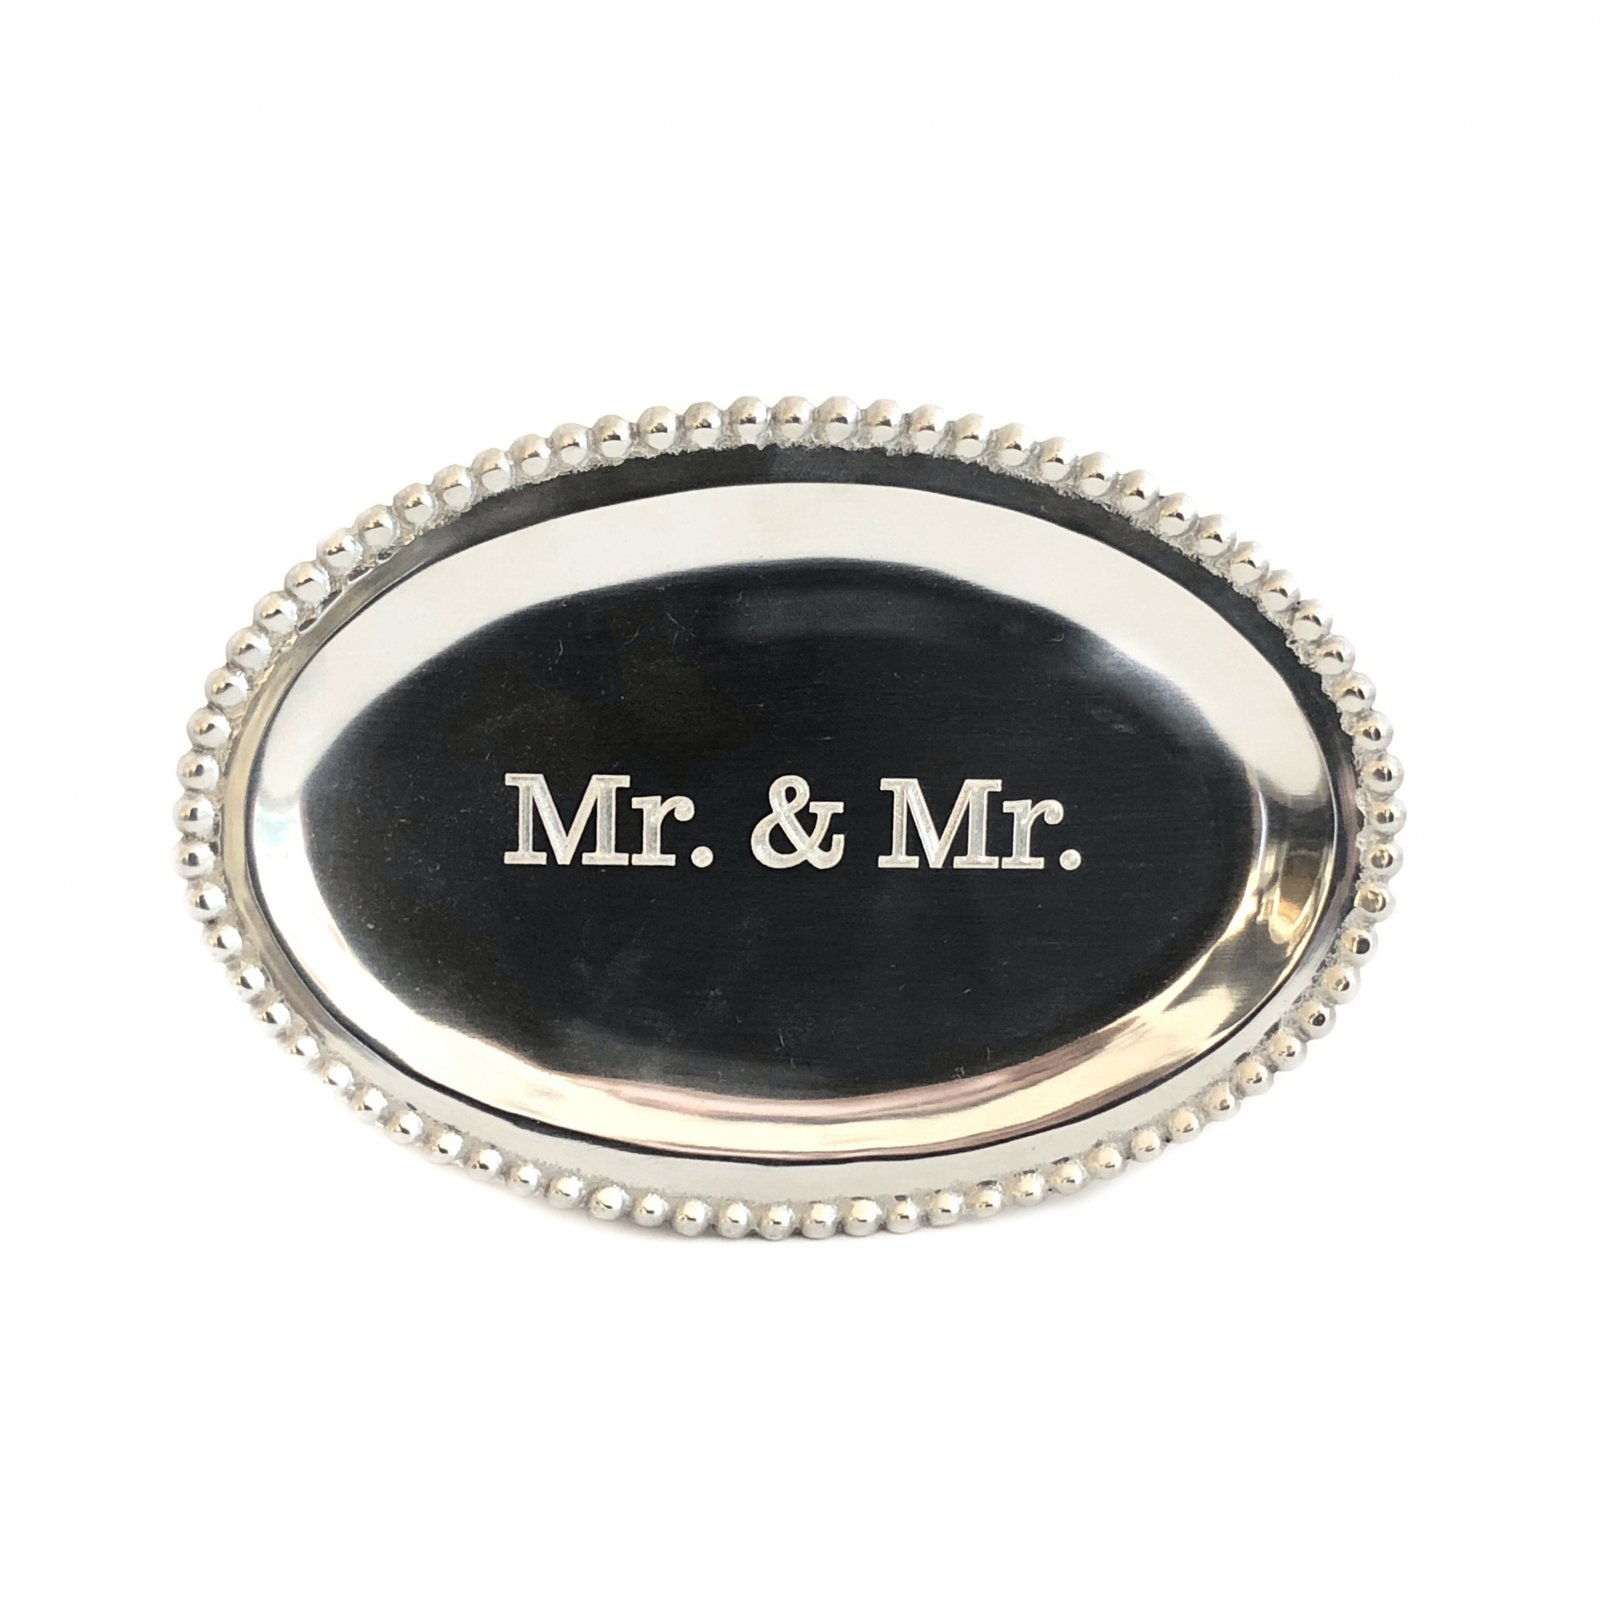 Mariposa Oval Tray - Mr & Mr